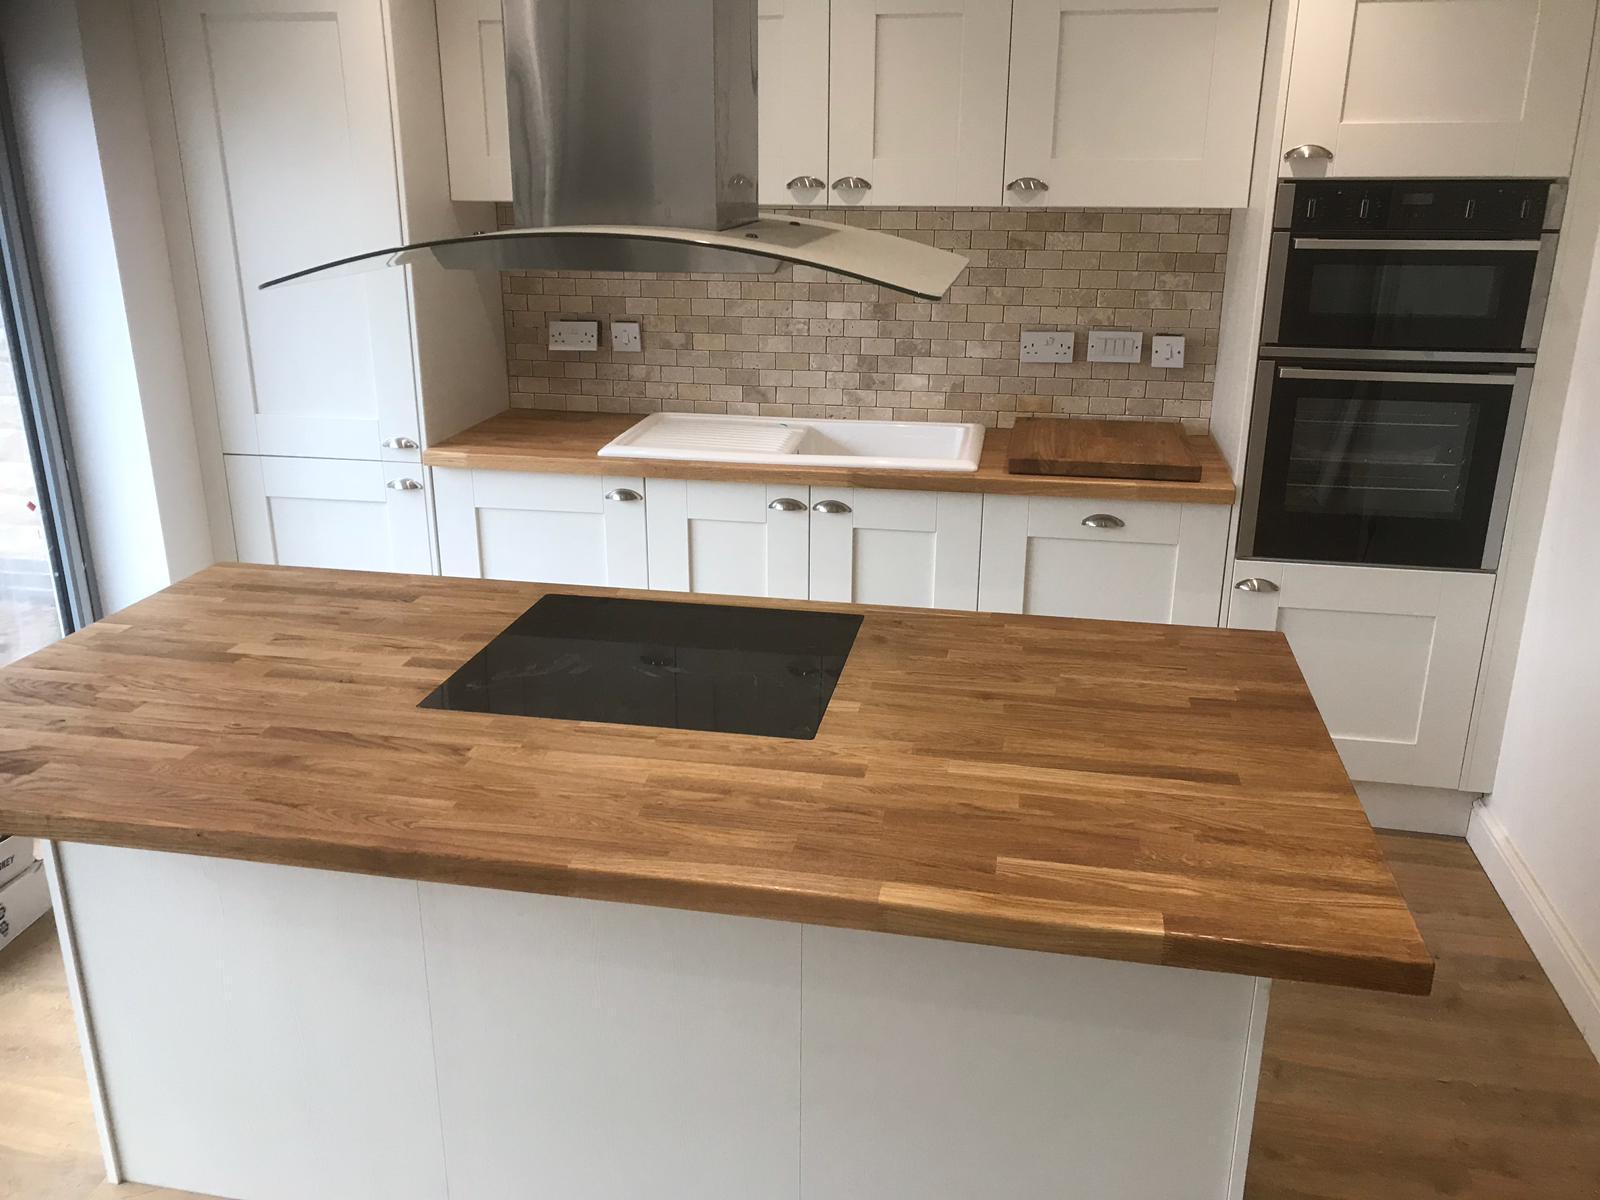 White and Light Wood Kitchen